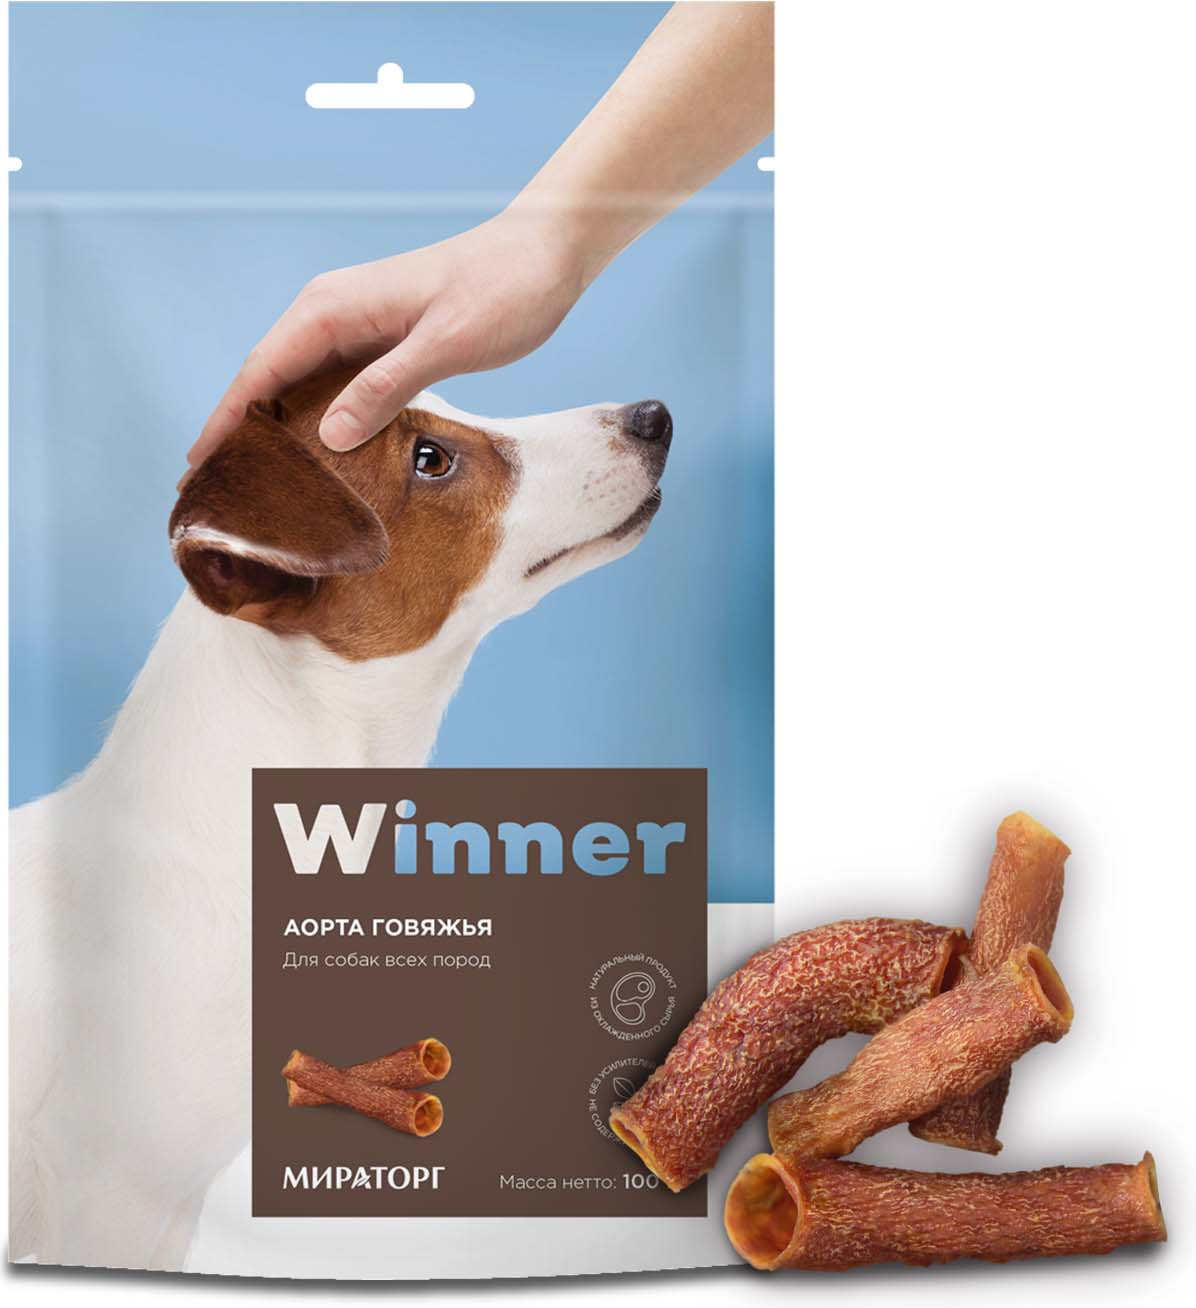 Лакомство Winner для собак, аорта говяжья, 100 г770034Winner Лакомство сухое для собак. Аорта говяжья. 100 гр